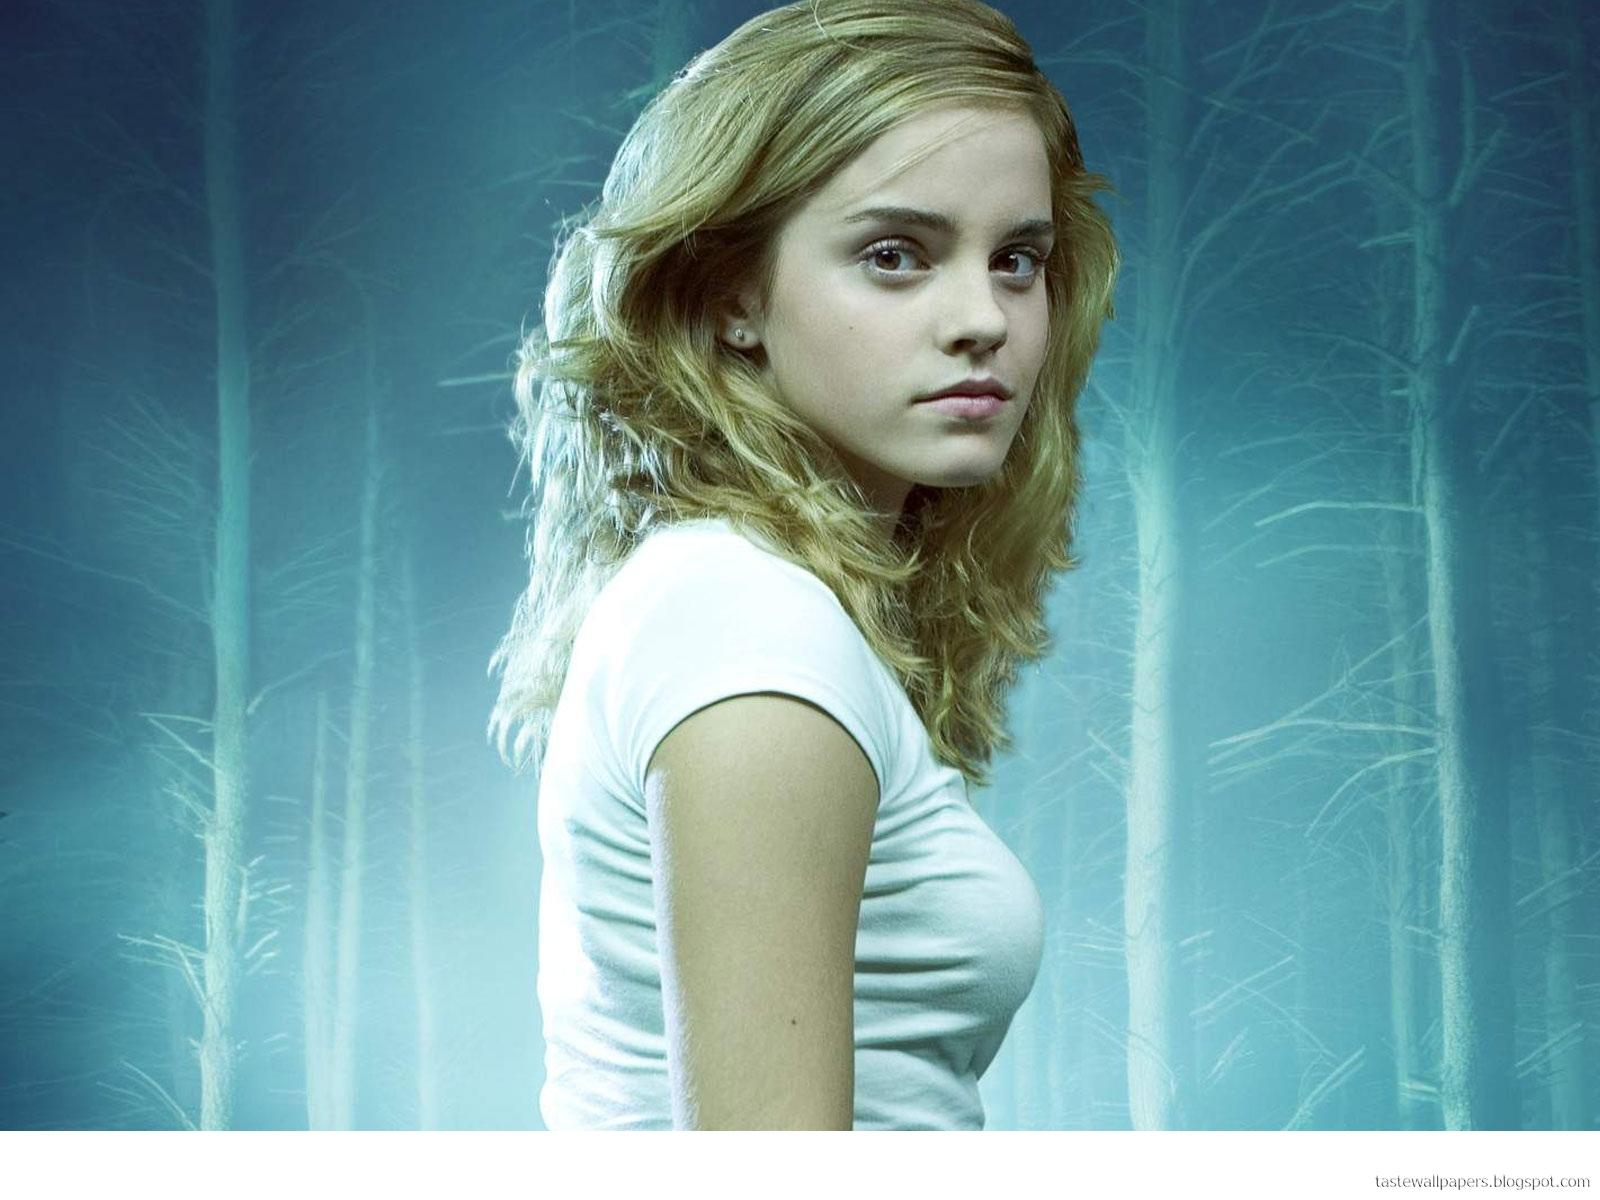 96] Hollywood Girls Wallpapers on WallpaperSafari 1600x1200